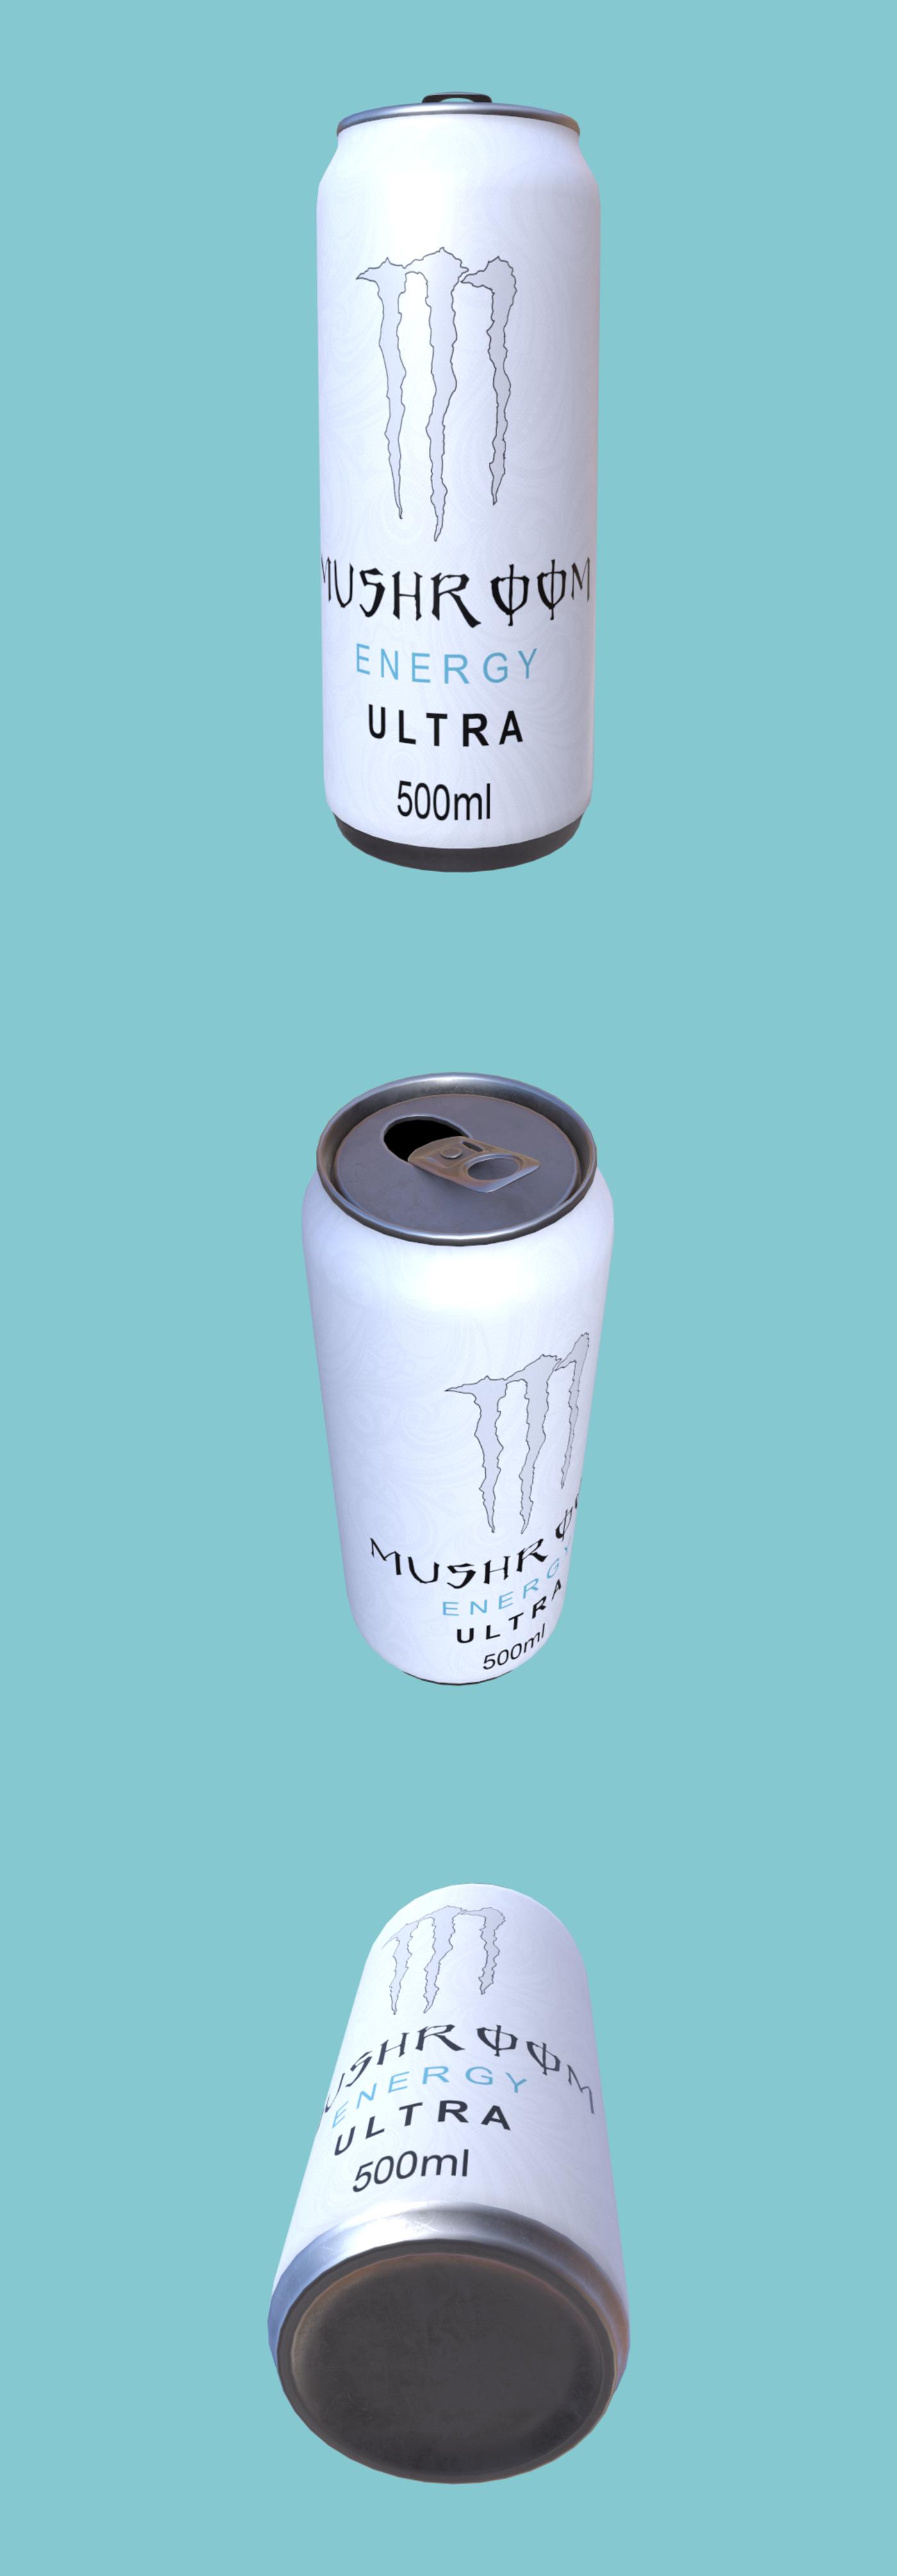 Mushroom Energy drink can